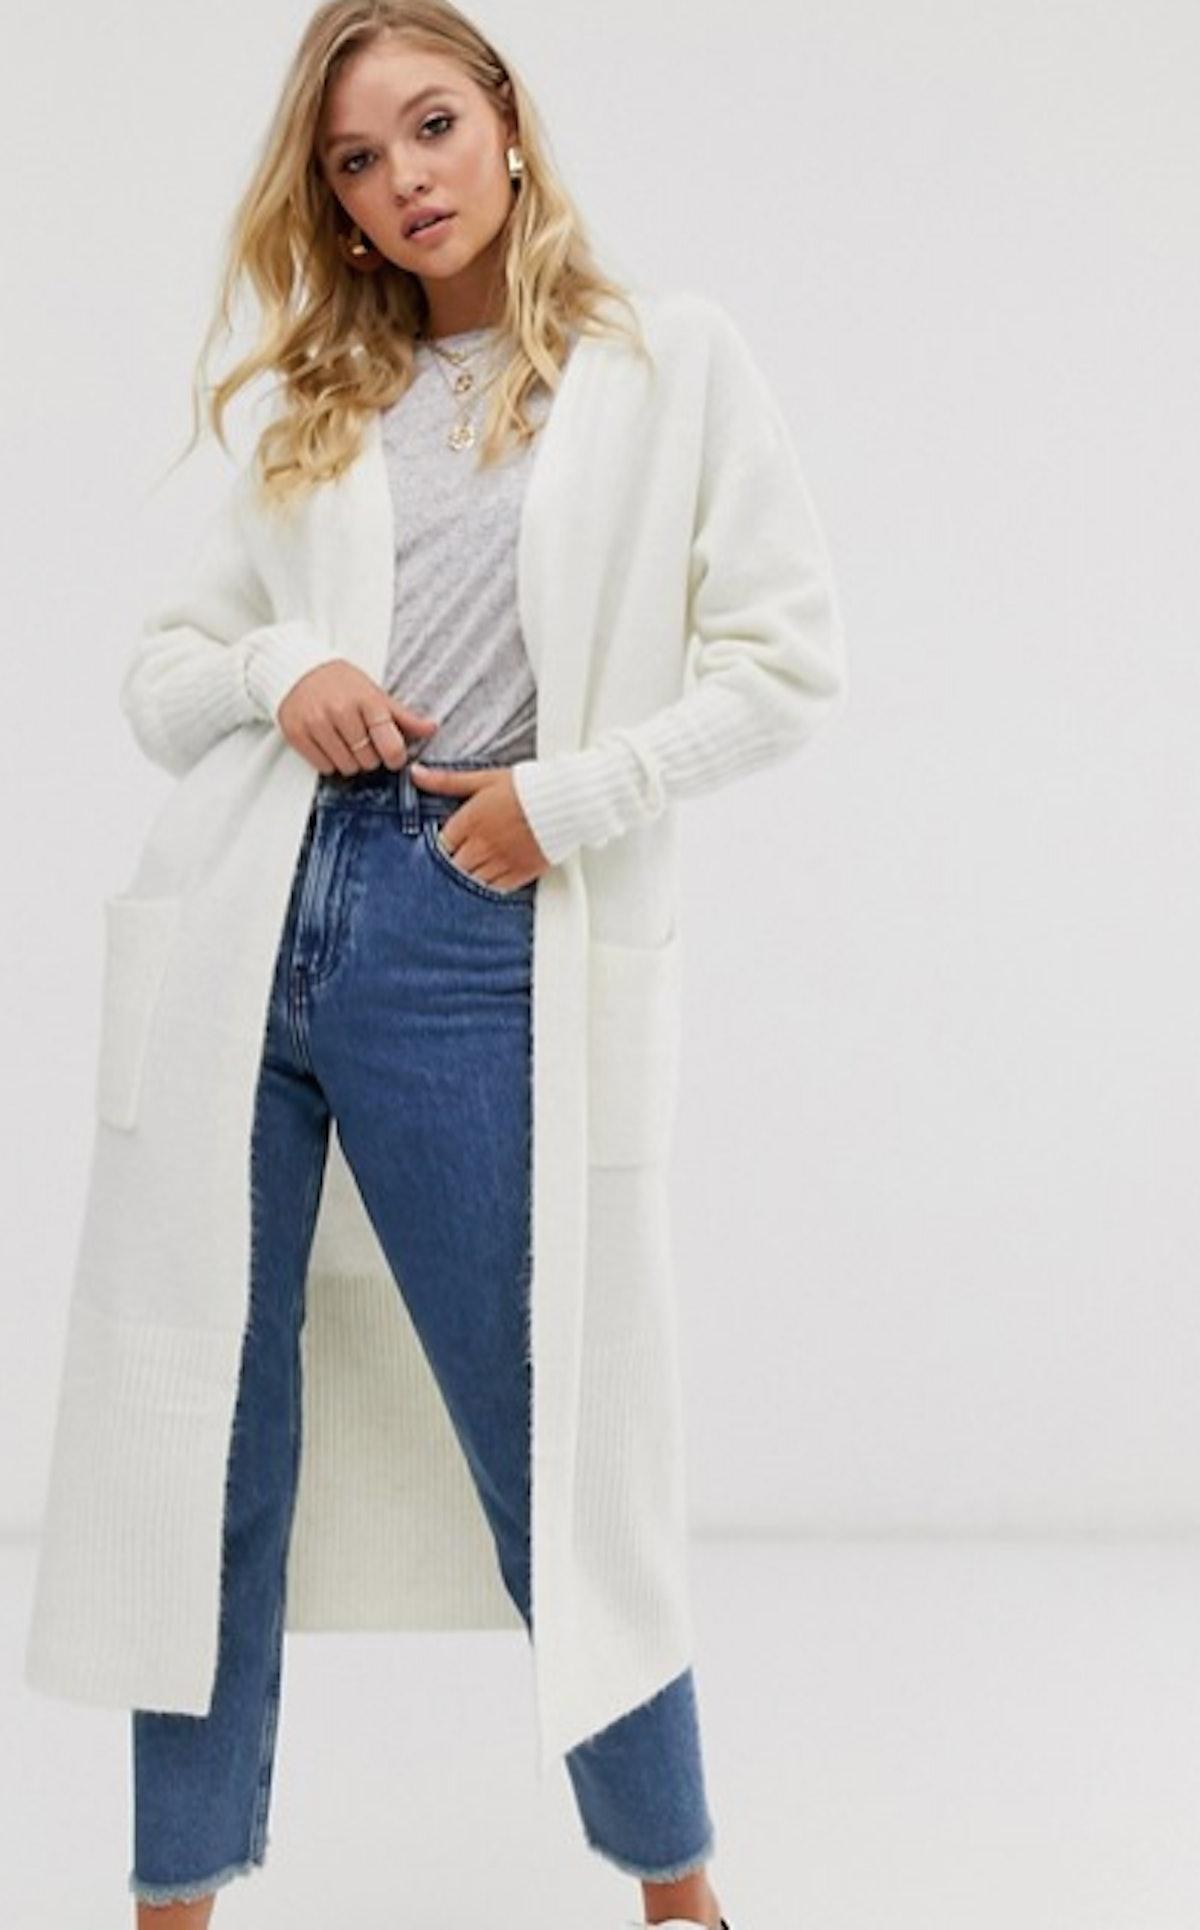 Micha Lounge Luxe oversized cardigan with rib knit cuffs